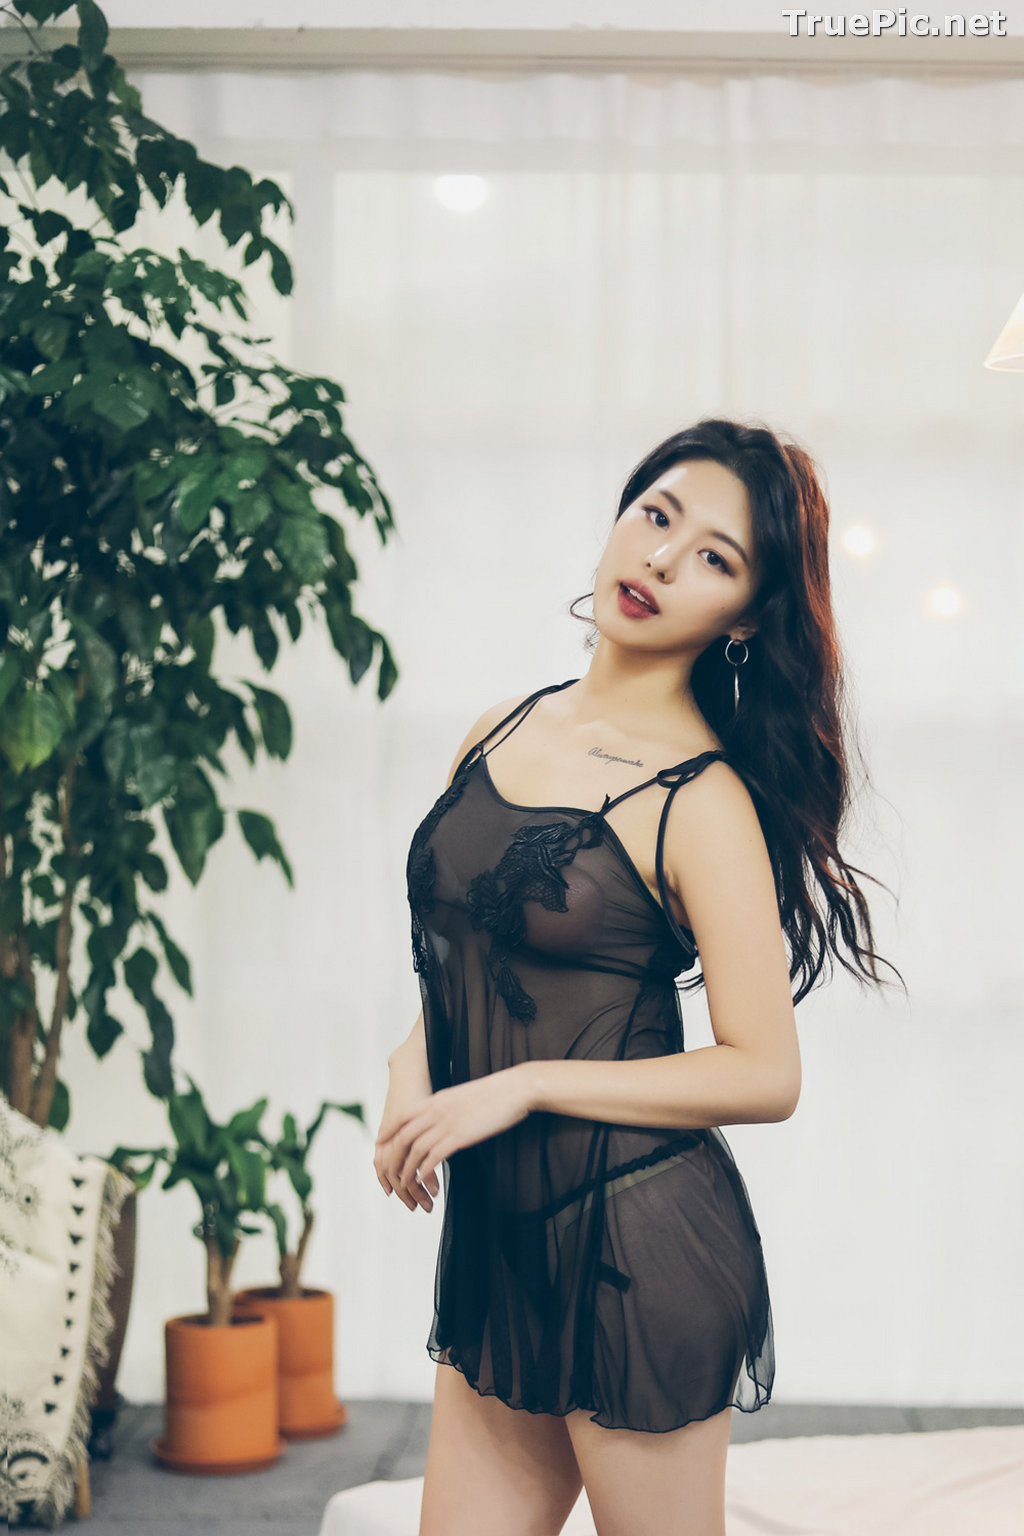 Image Jung Yuna - Korean Fashion Model - Black Transparent Lingerie Set - TruePic.net - Picture-1